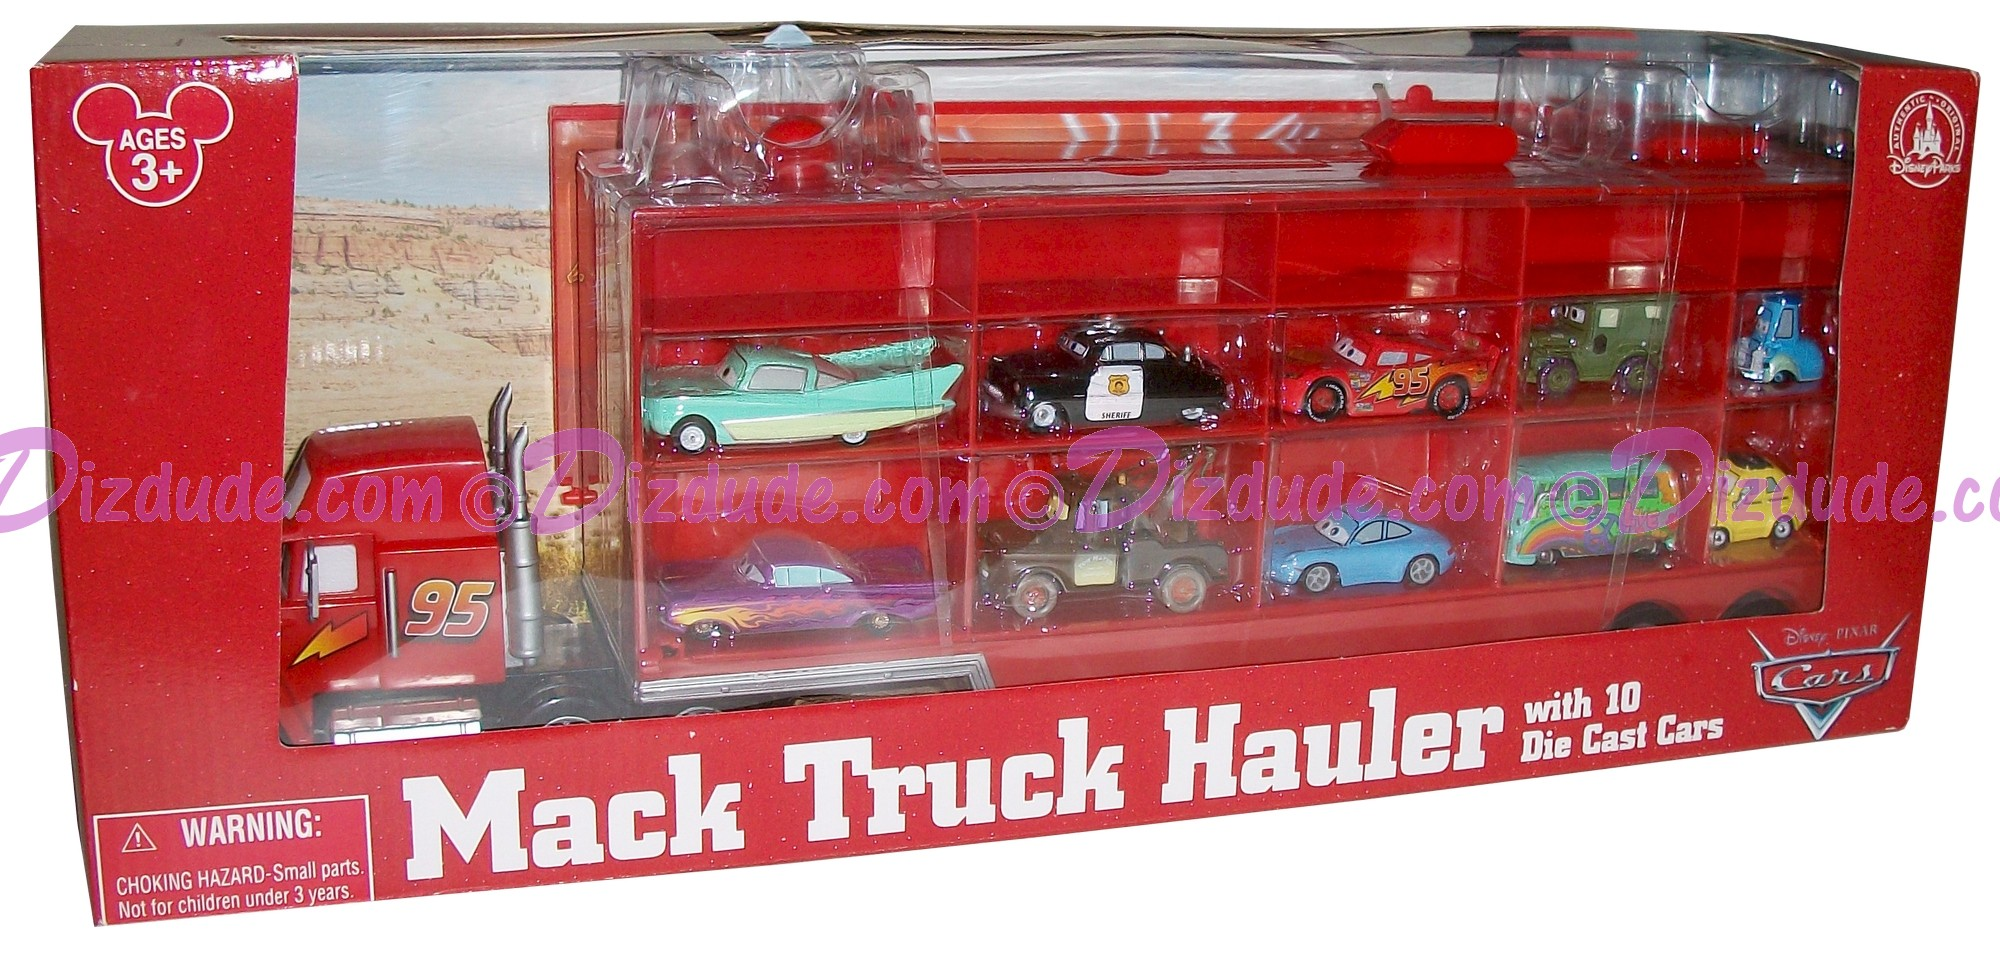 Dizdude Com Disney Pixar Cars Mack Truck Hauler